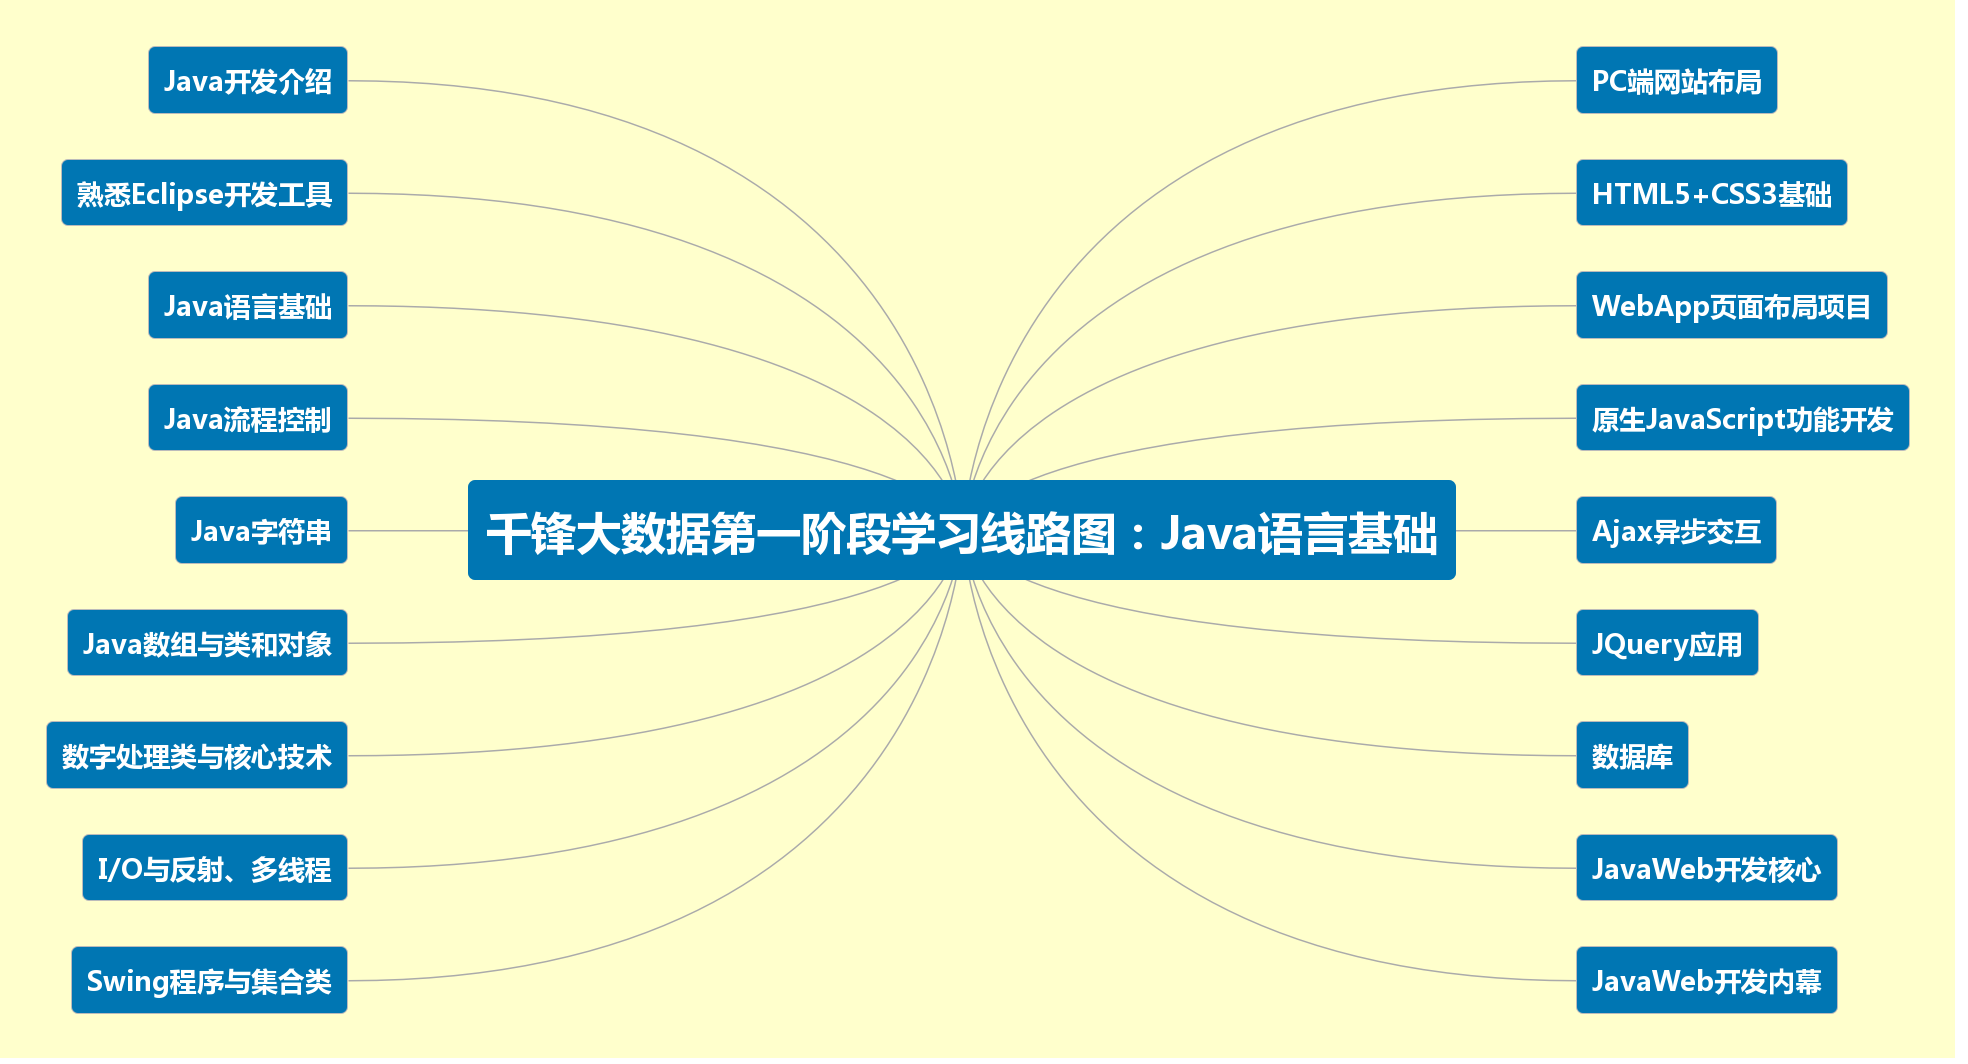 java的六大设计原则有哪些